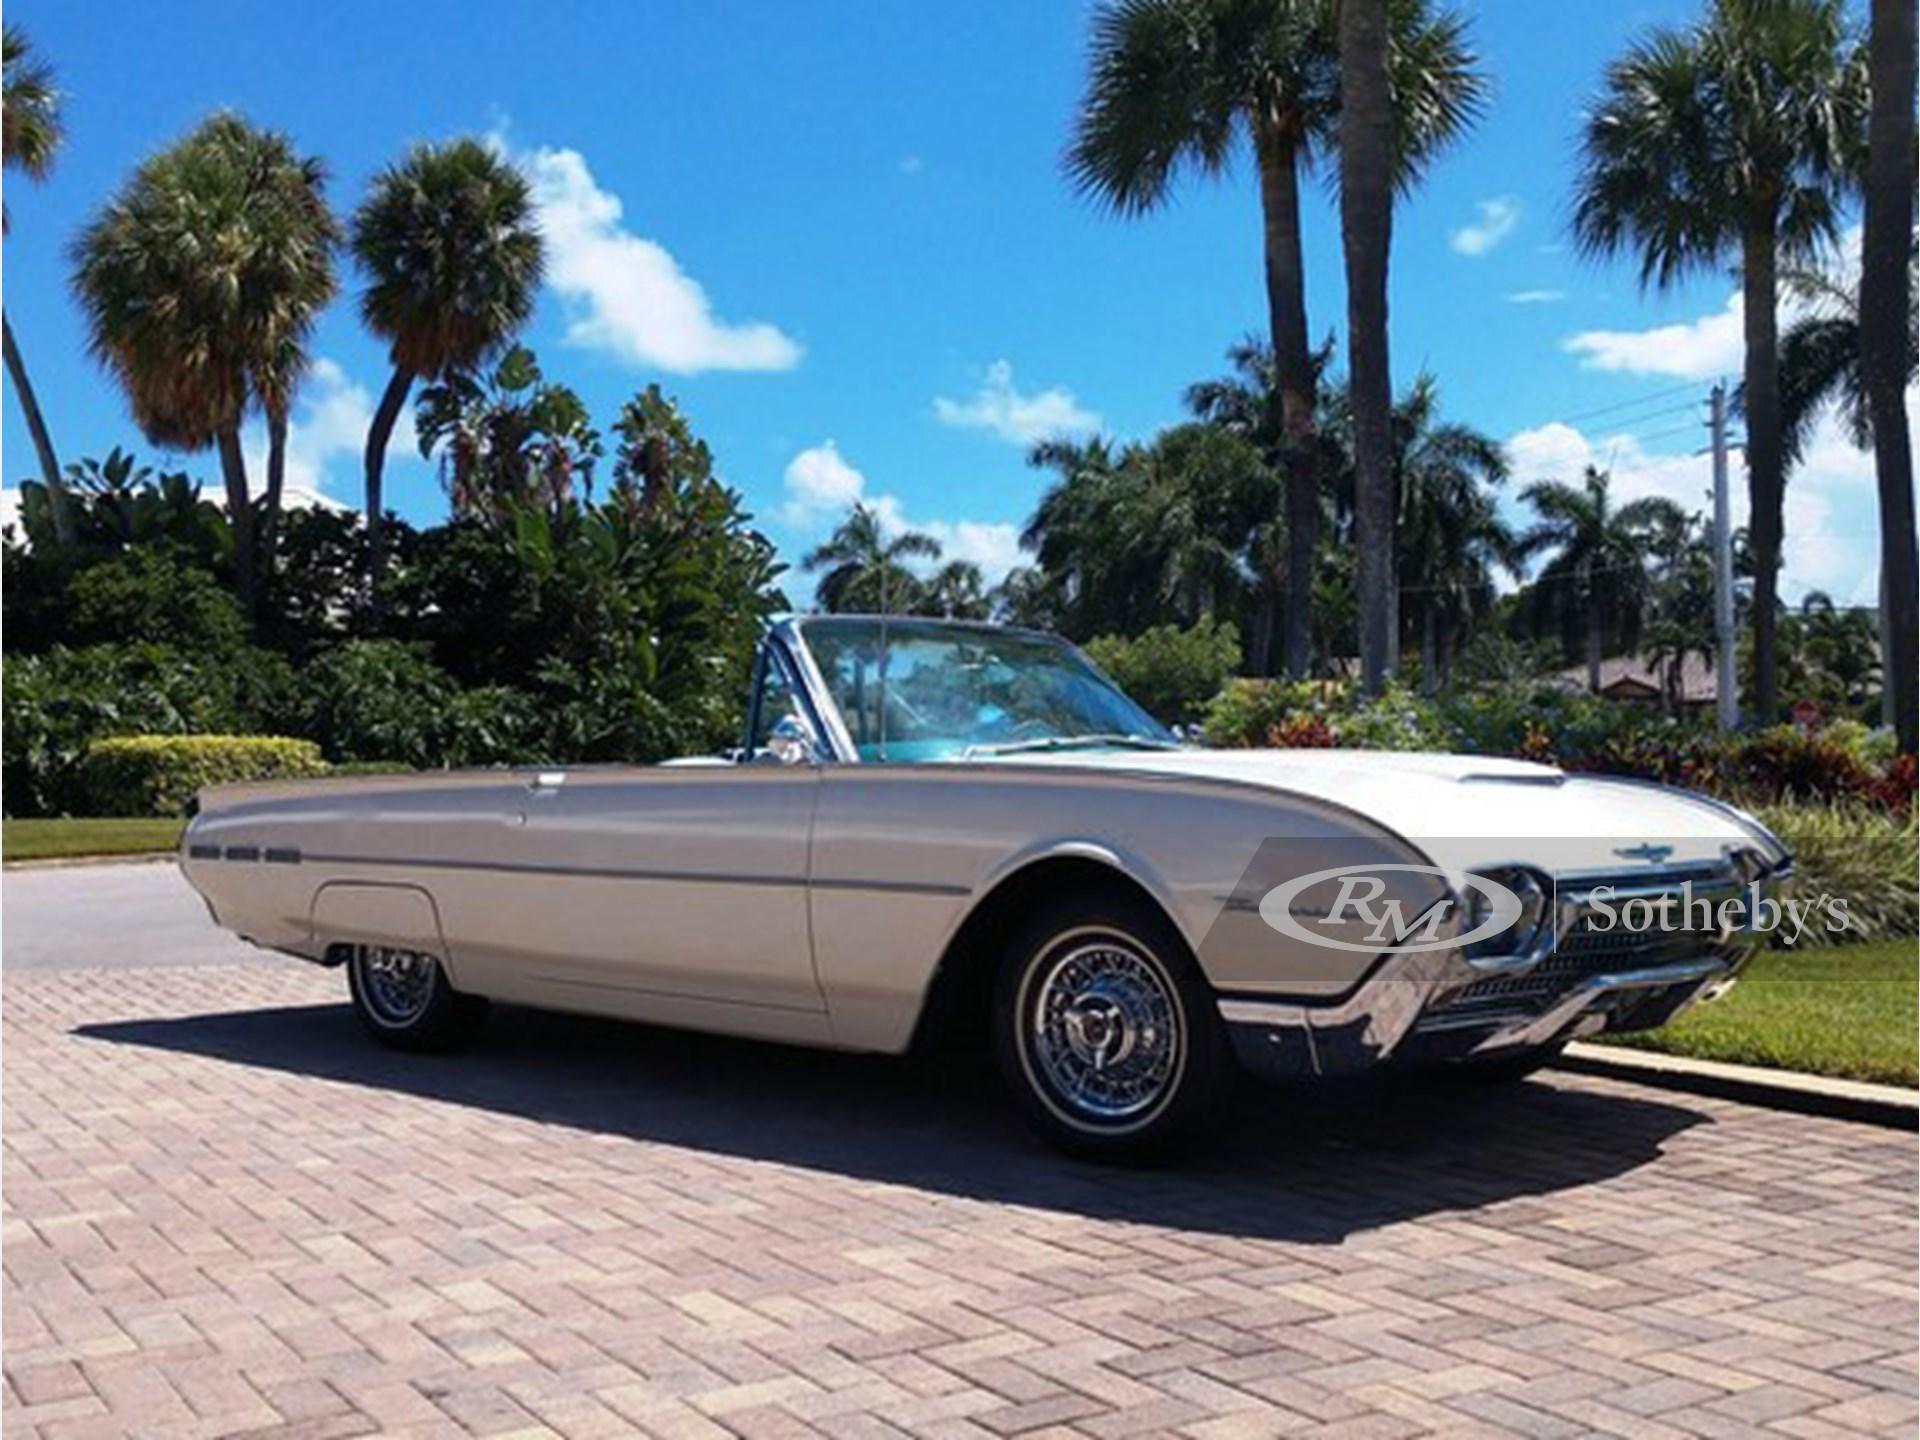 1962 Ford Thunderbird 'M-Code' Convertible